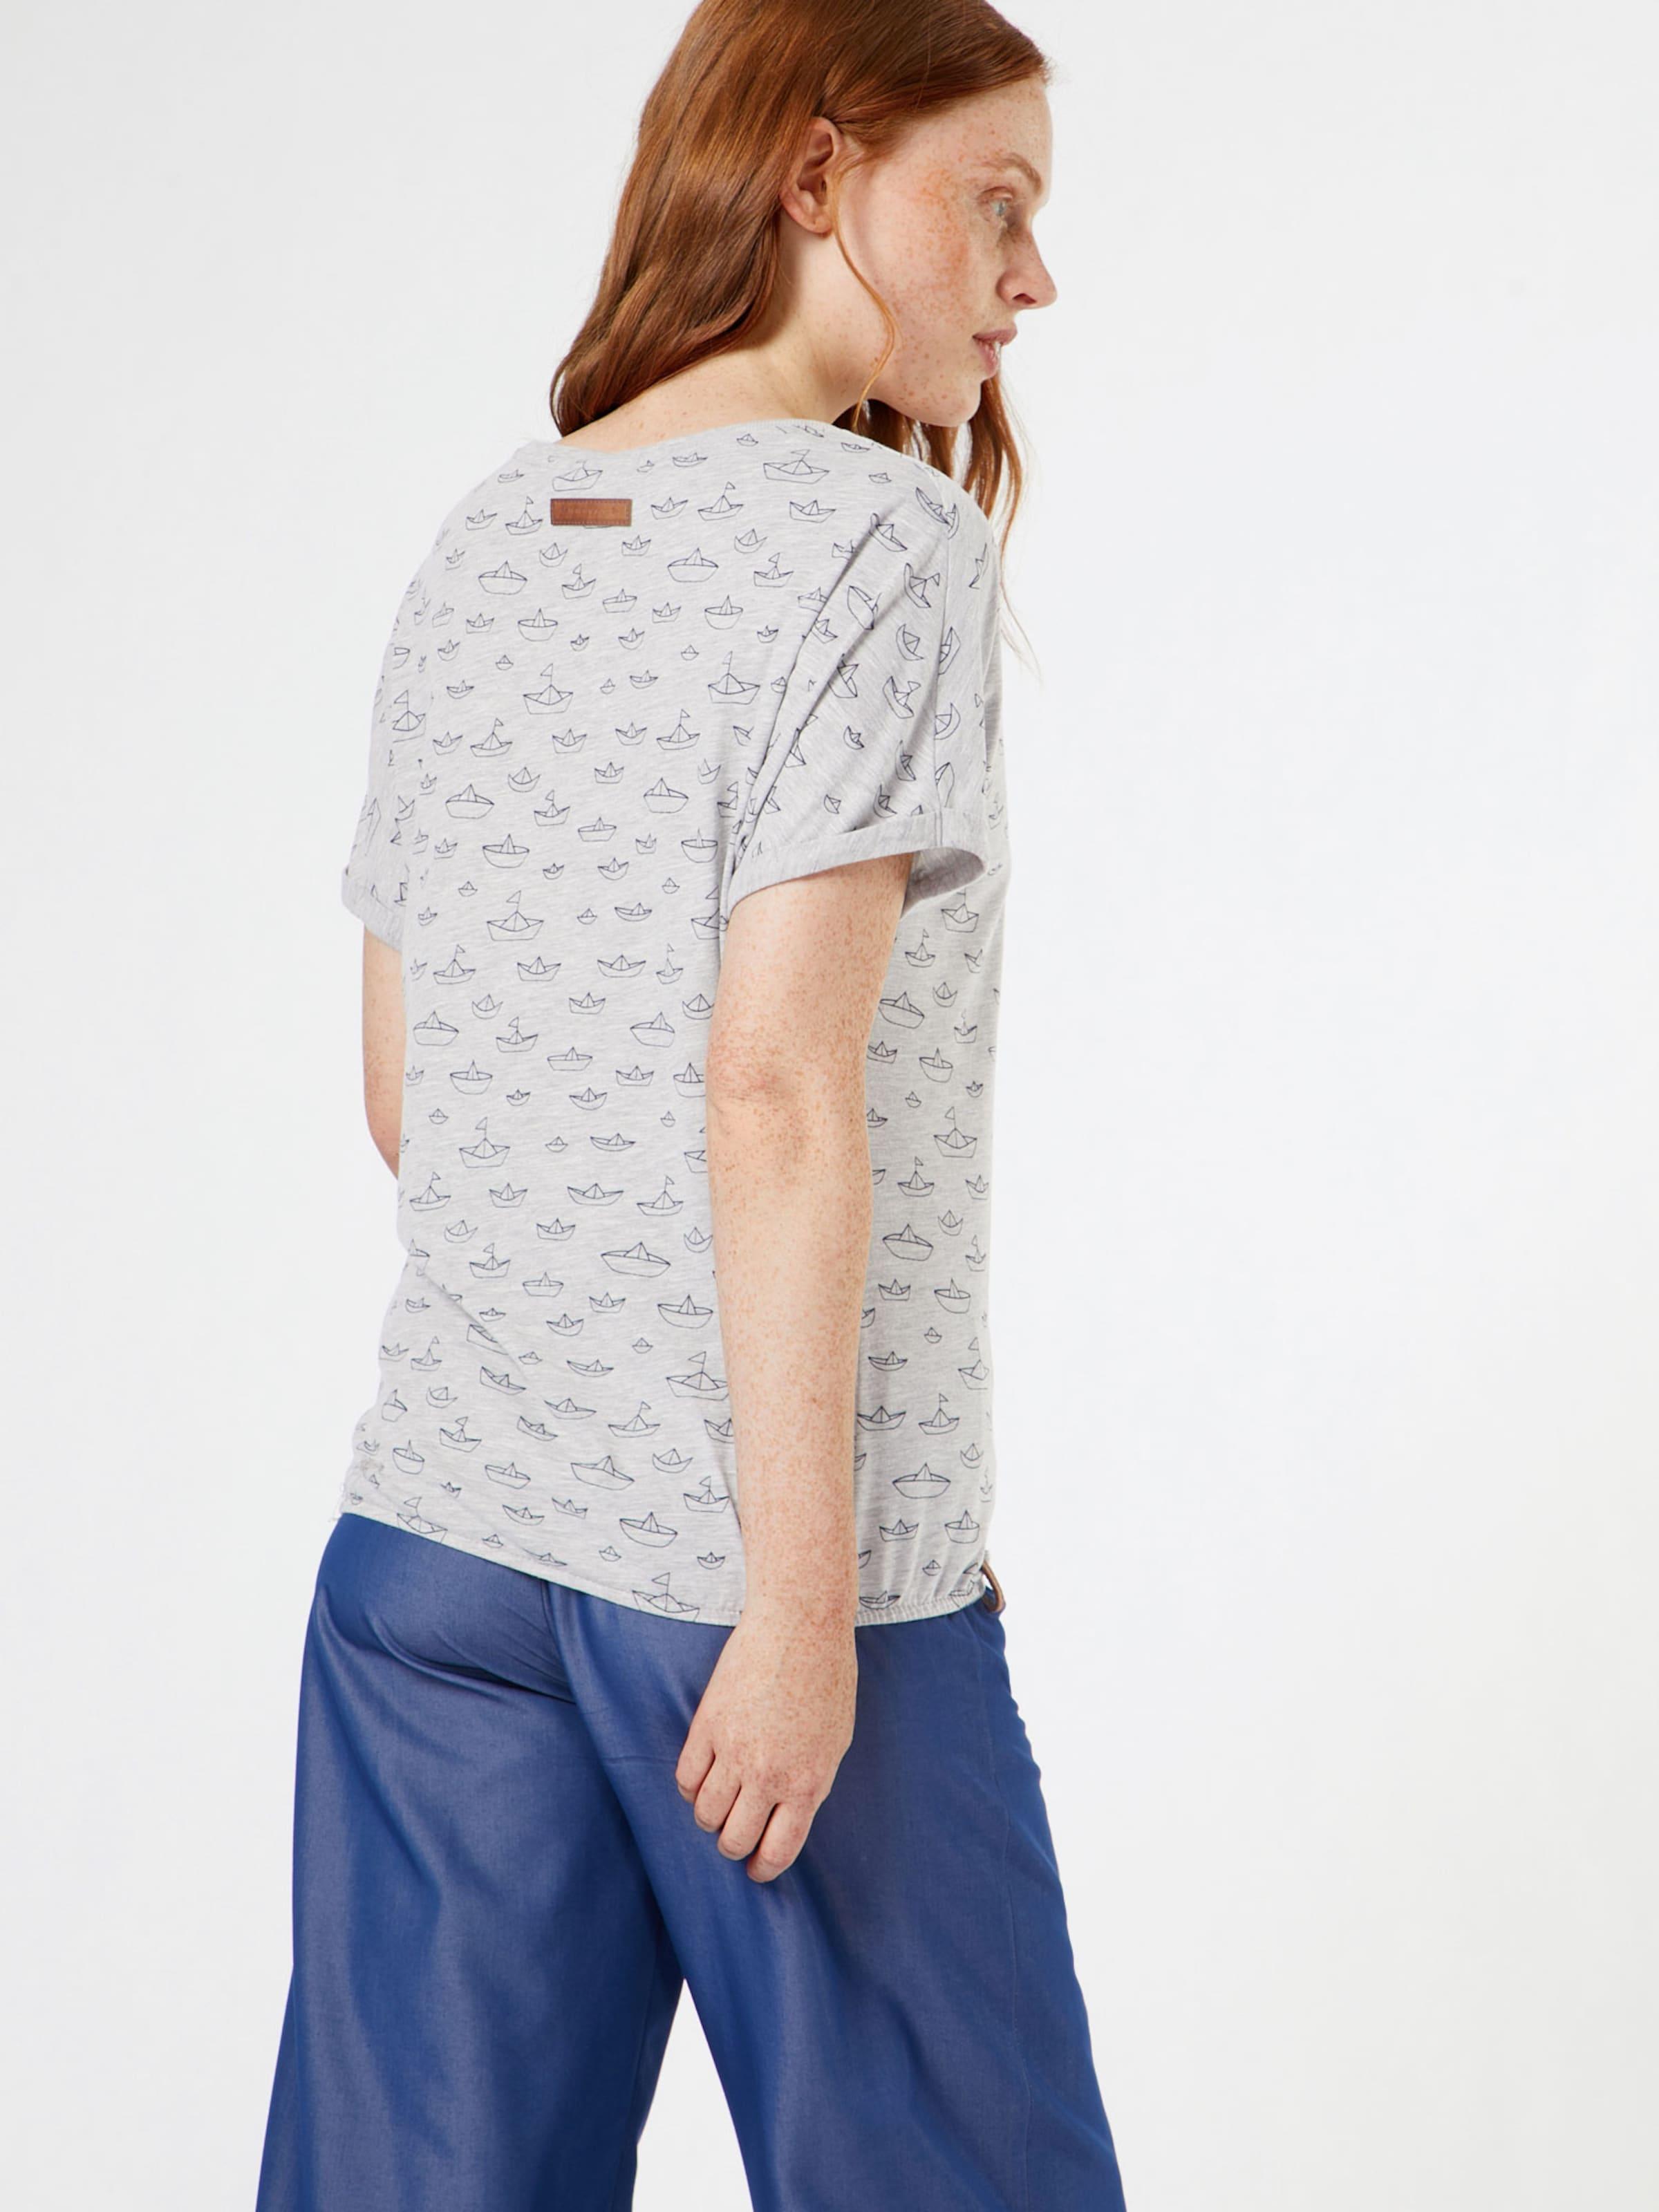 Shirt T 'G' naketano 'G' Shirt T naketano naketano 8xSS6